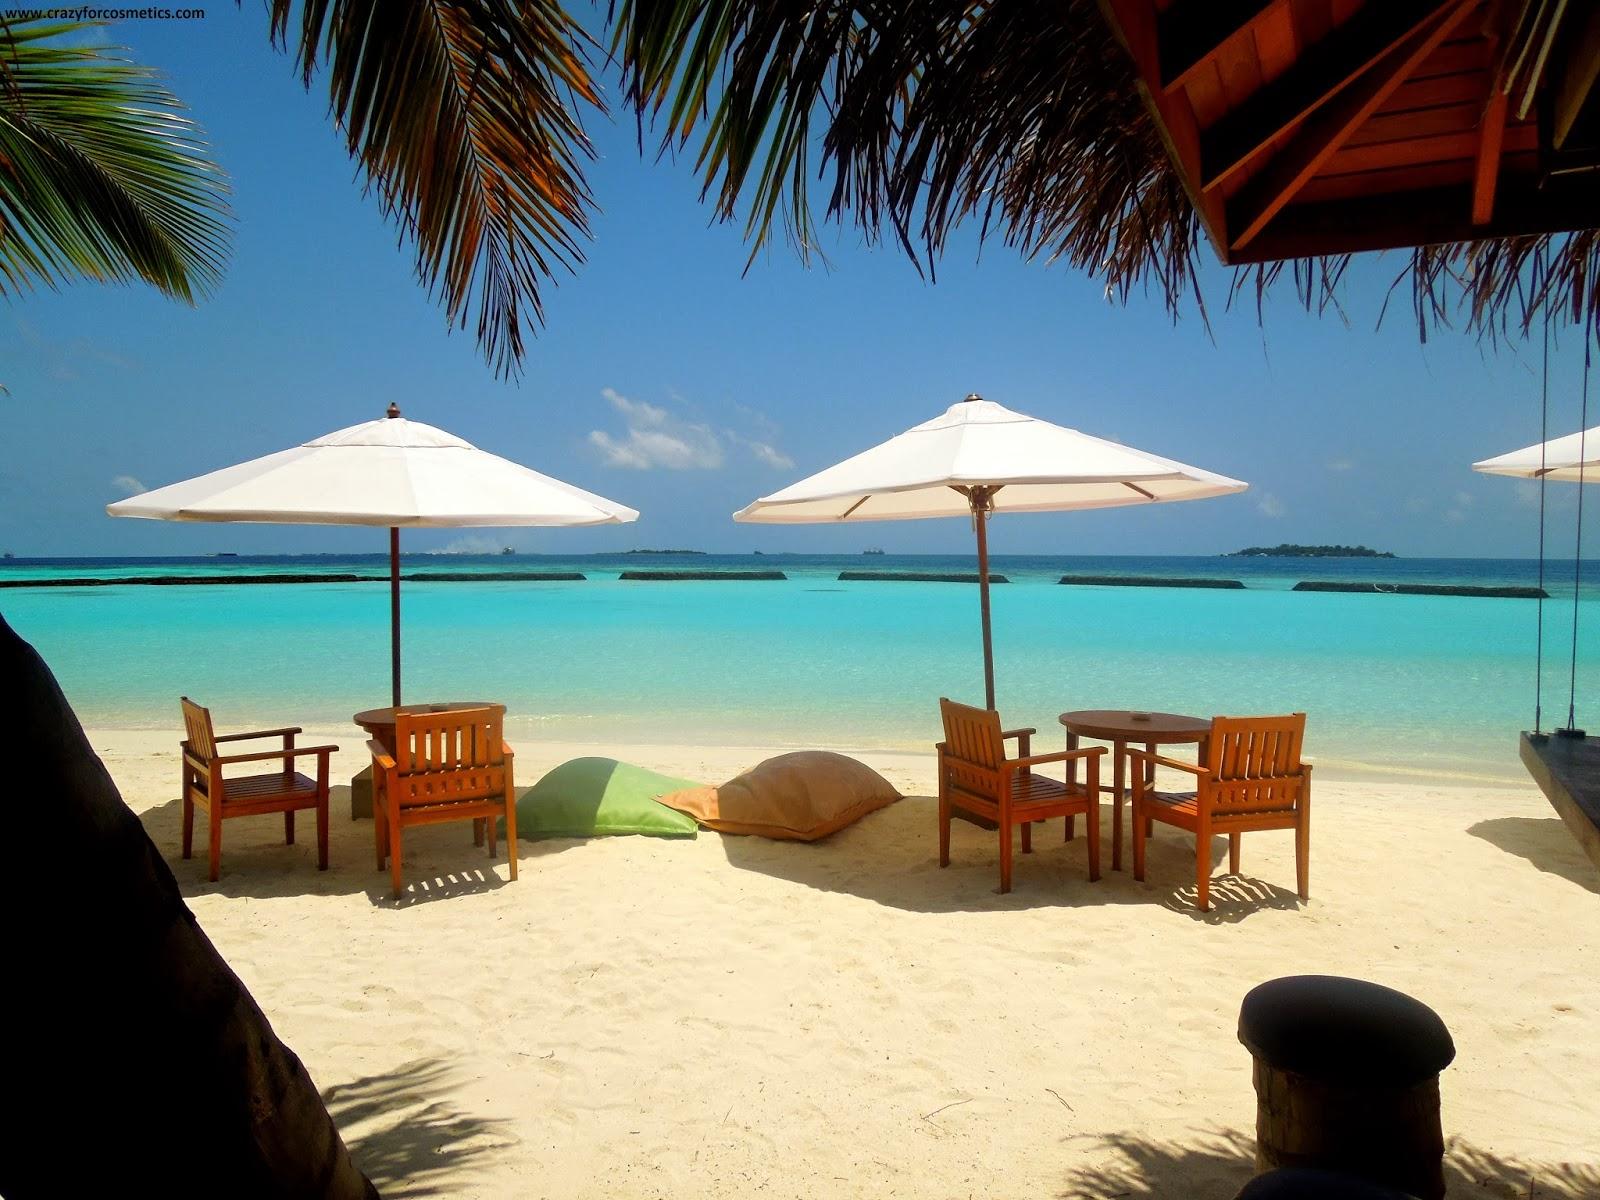 Kurumba Maldives Beach and House Reef